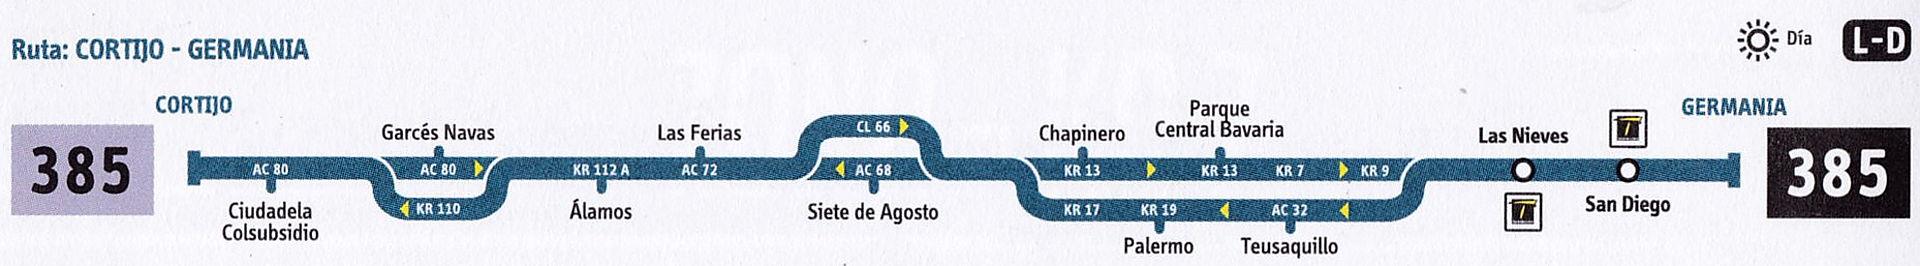 Ruta SITP: 385 Cortijo ↔ Germania [Urbana] 6